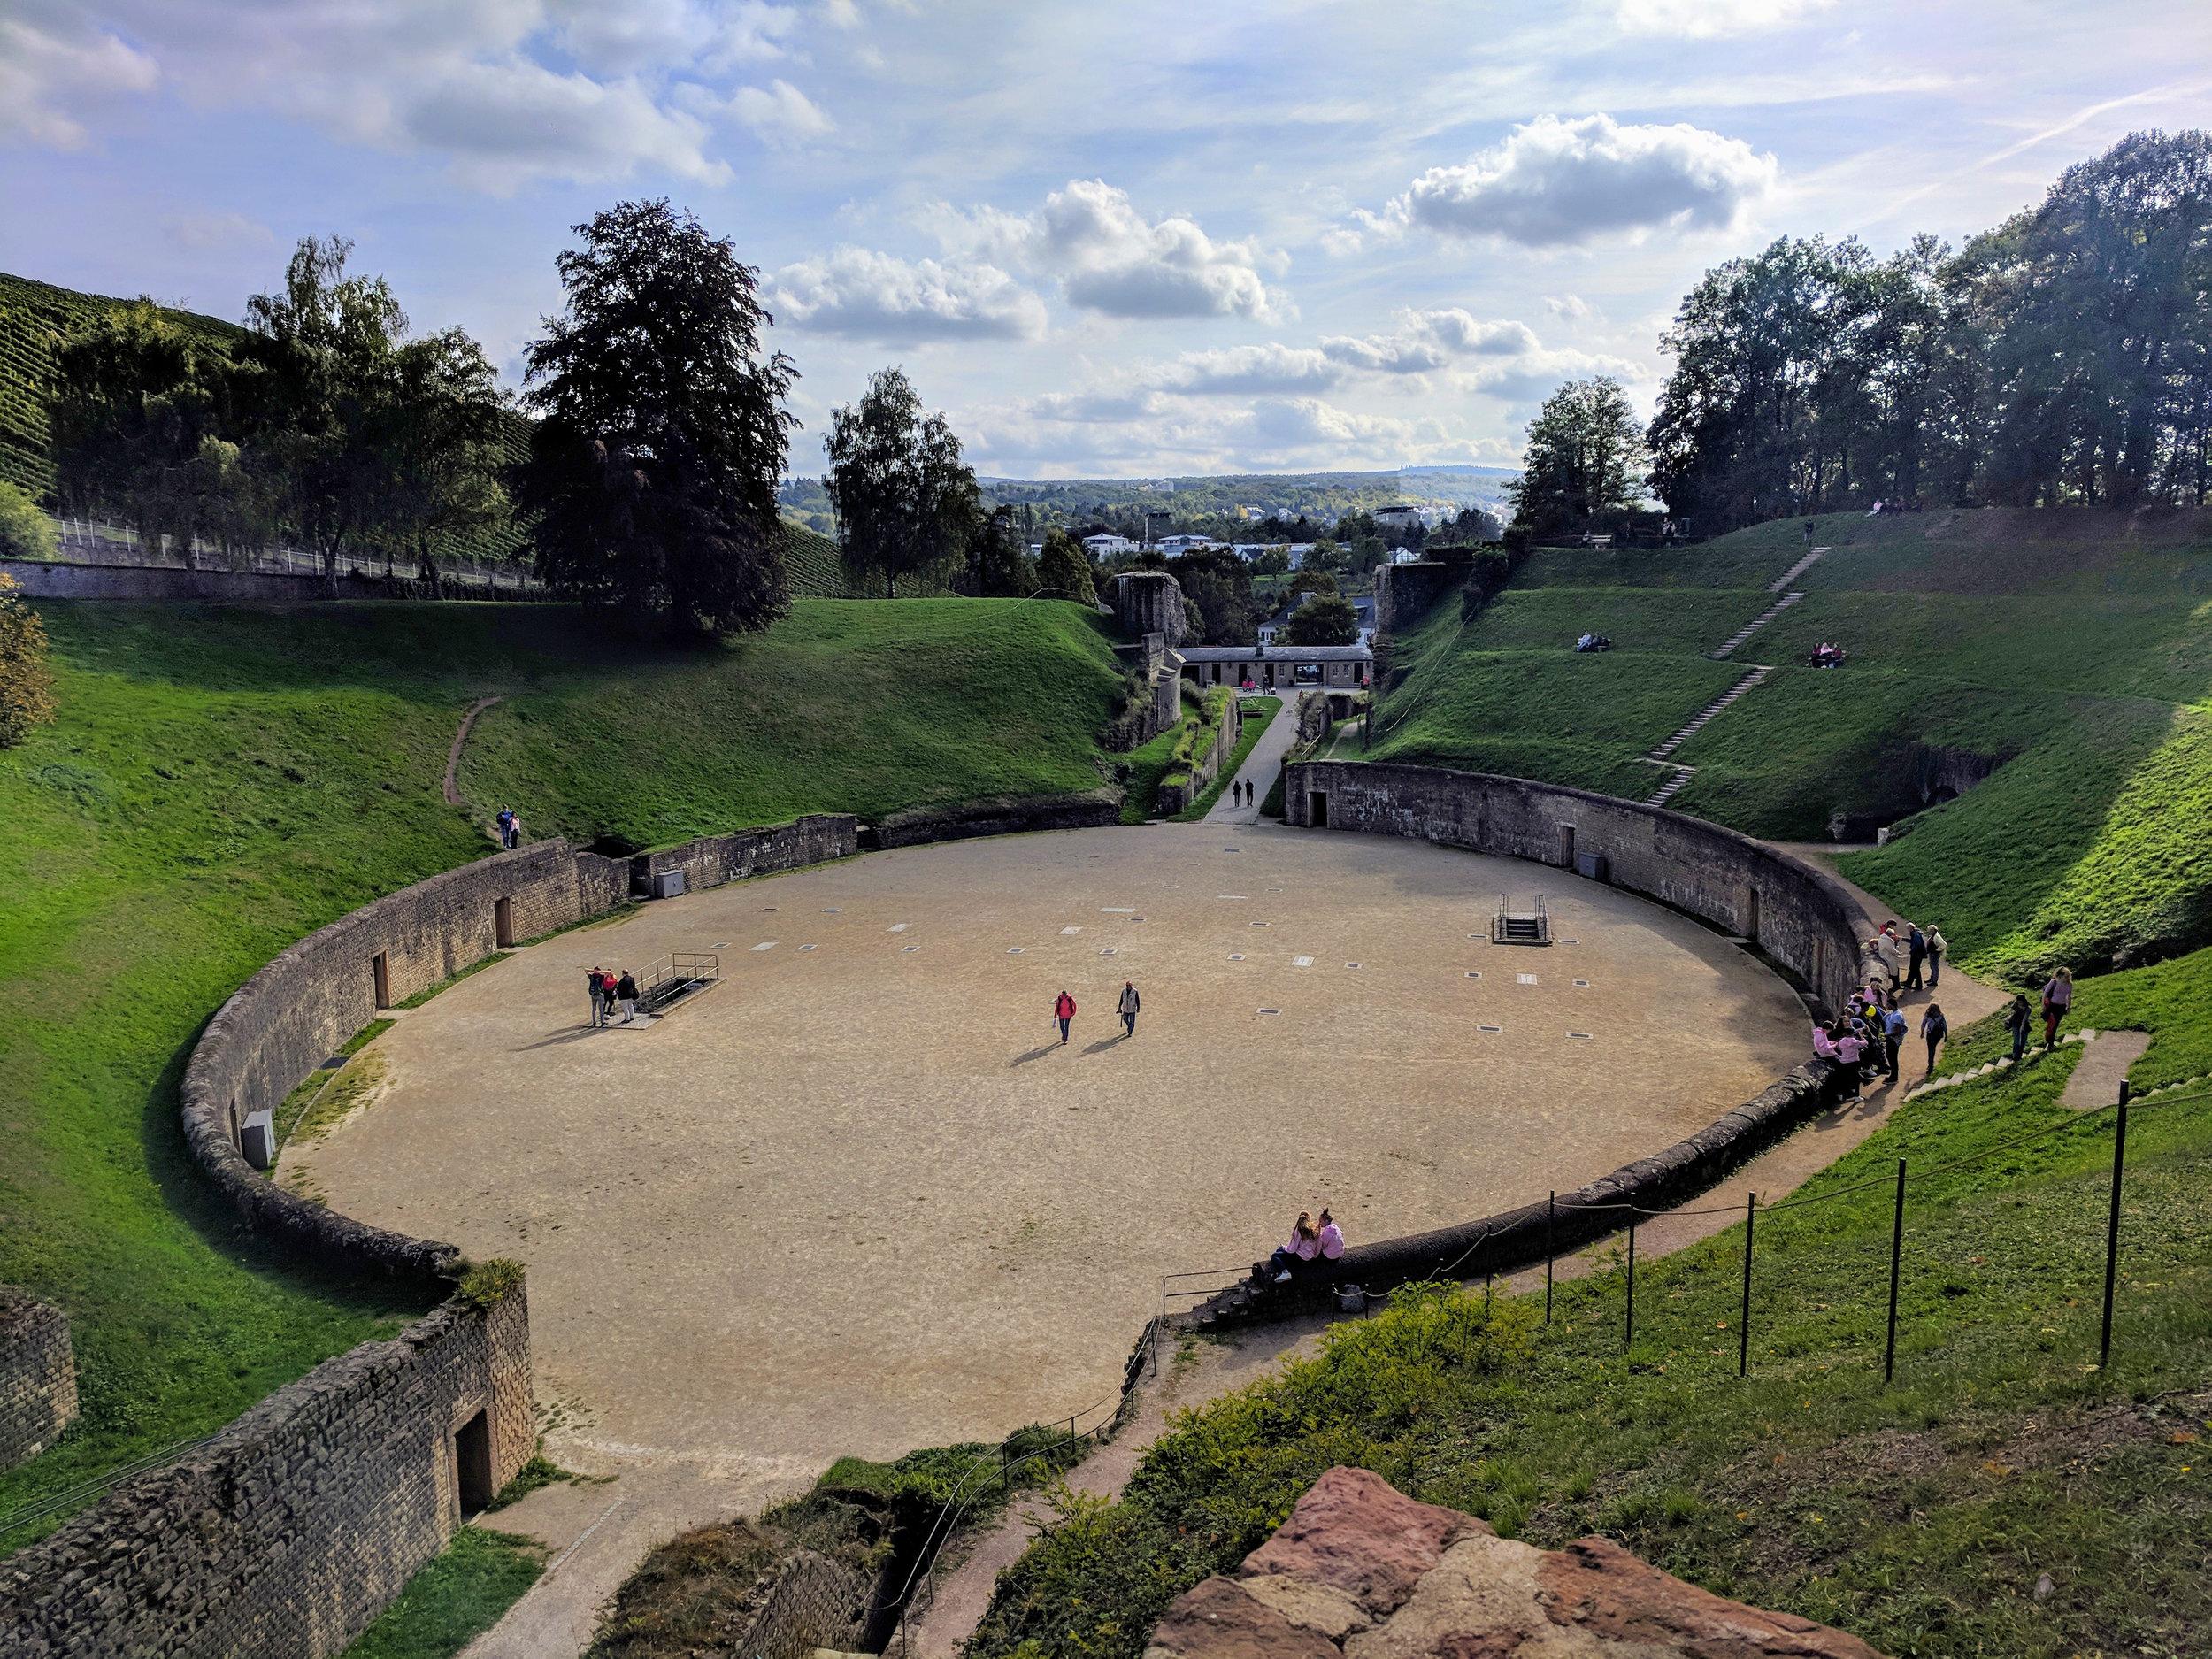 The Roman Amphitheater in Trier